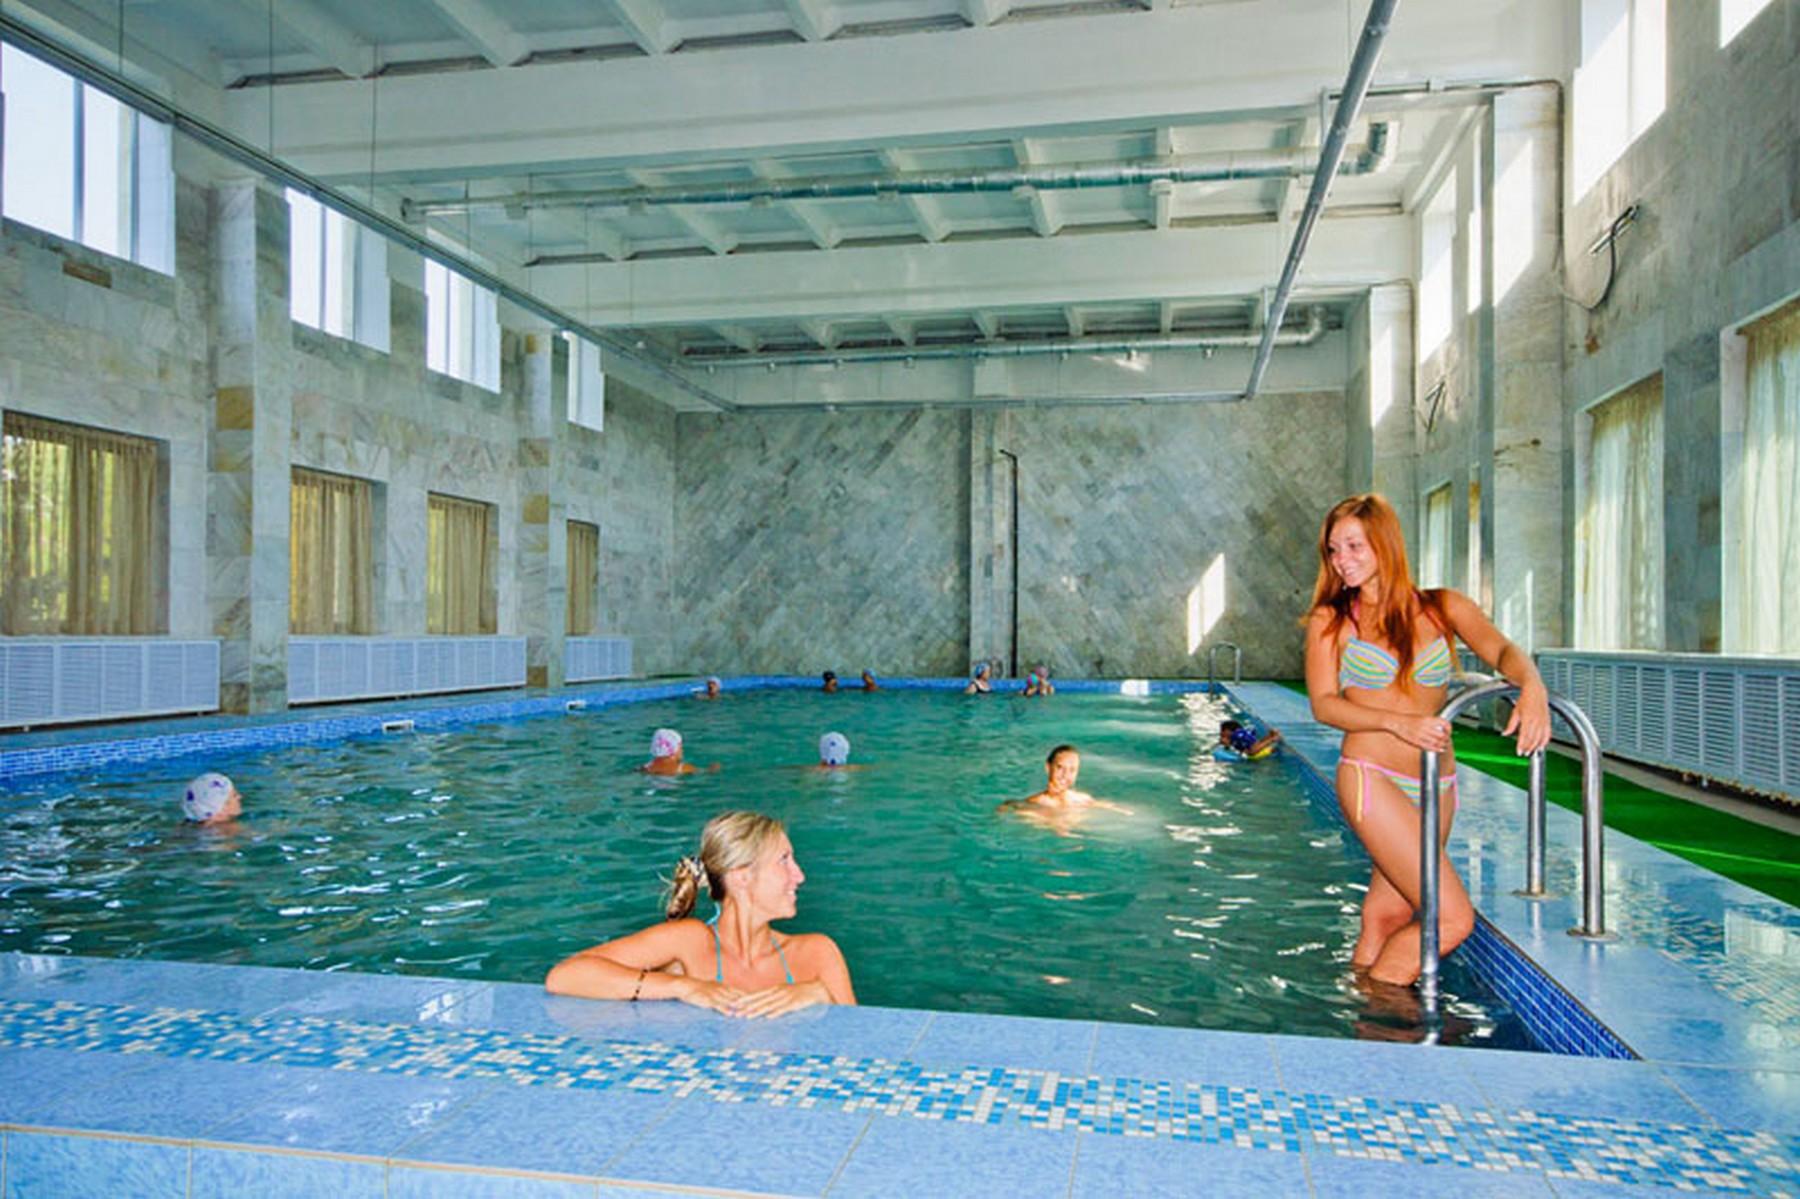 анапа закрытый бассейн в пансионате кристалл фото сирени